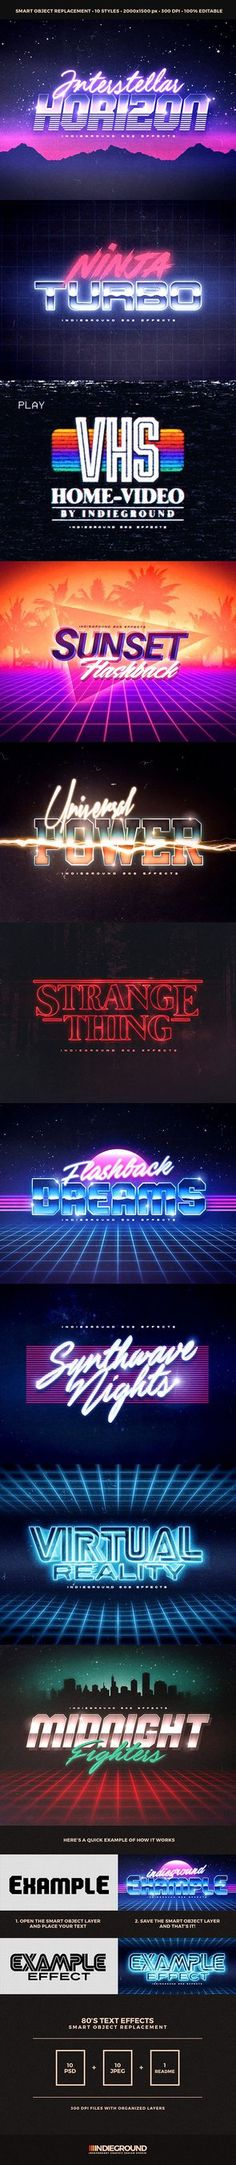 vaporwave font Retro Text Effects f - vaporwave Effects Photoshop, Text Effects, Photoshop Actions, Graphisches Design, Retro Design, Logo Design, Design Ideas, Cyberpunk, Vaporwave